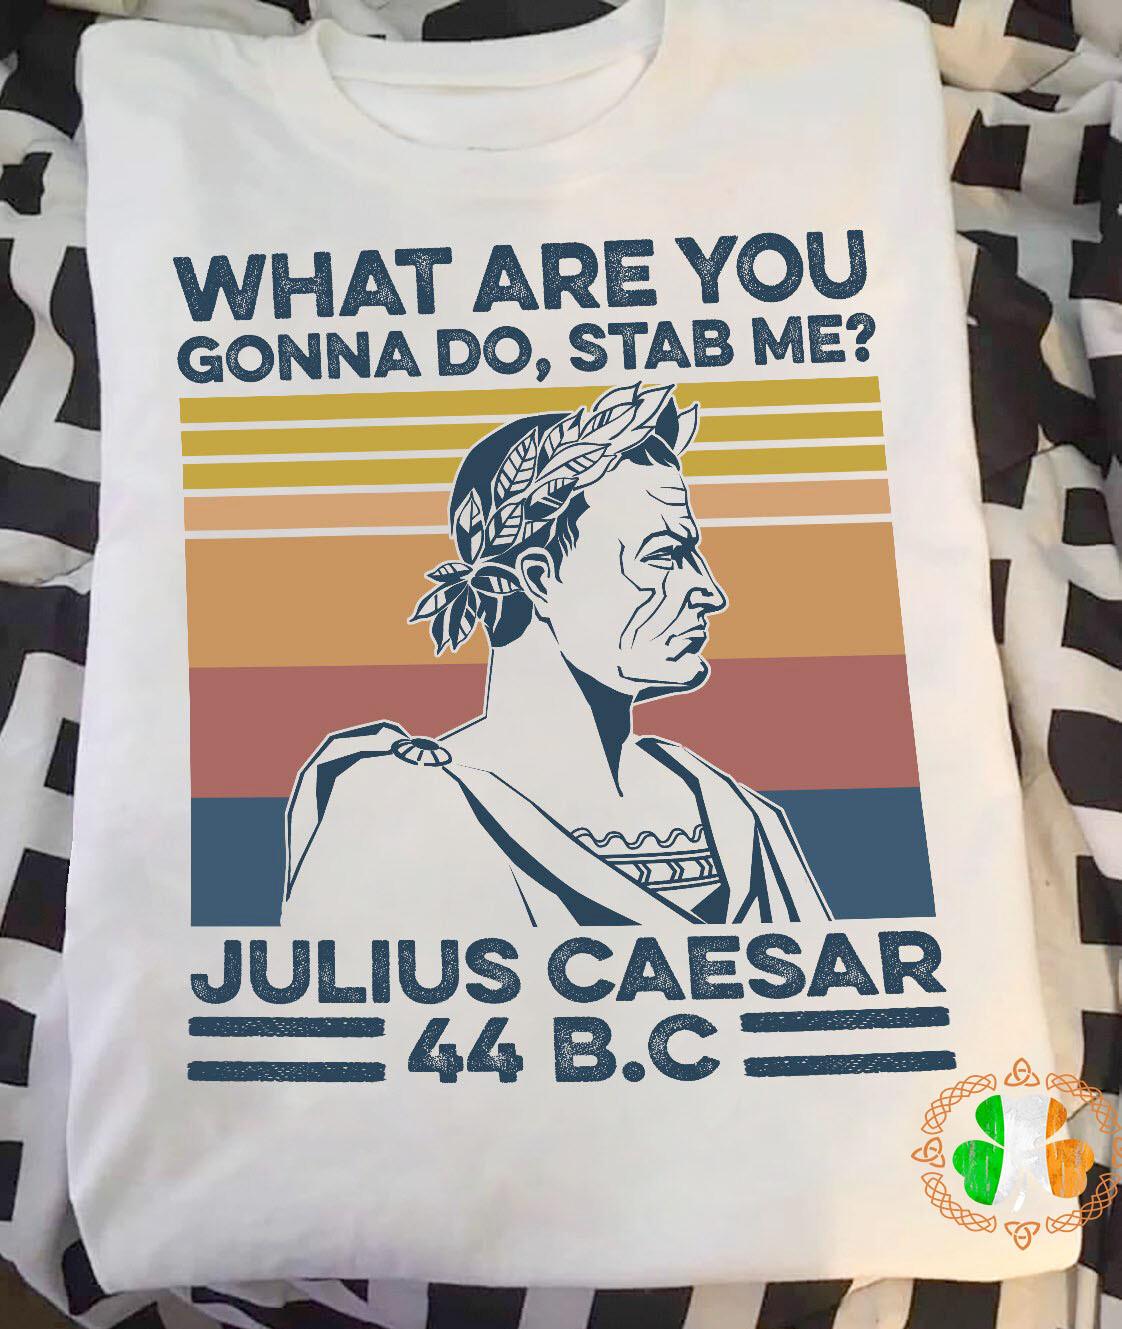 What are you gonna do stab me julius caesar 44 bc vintage retro shirt